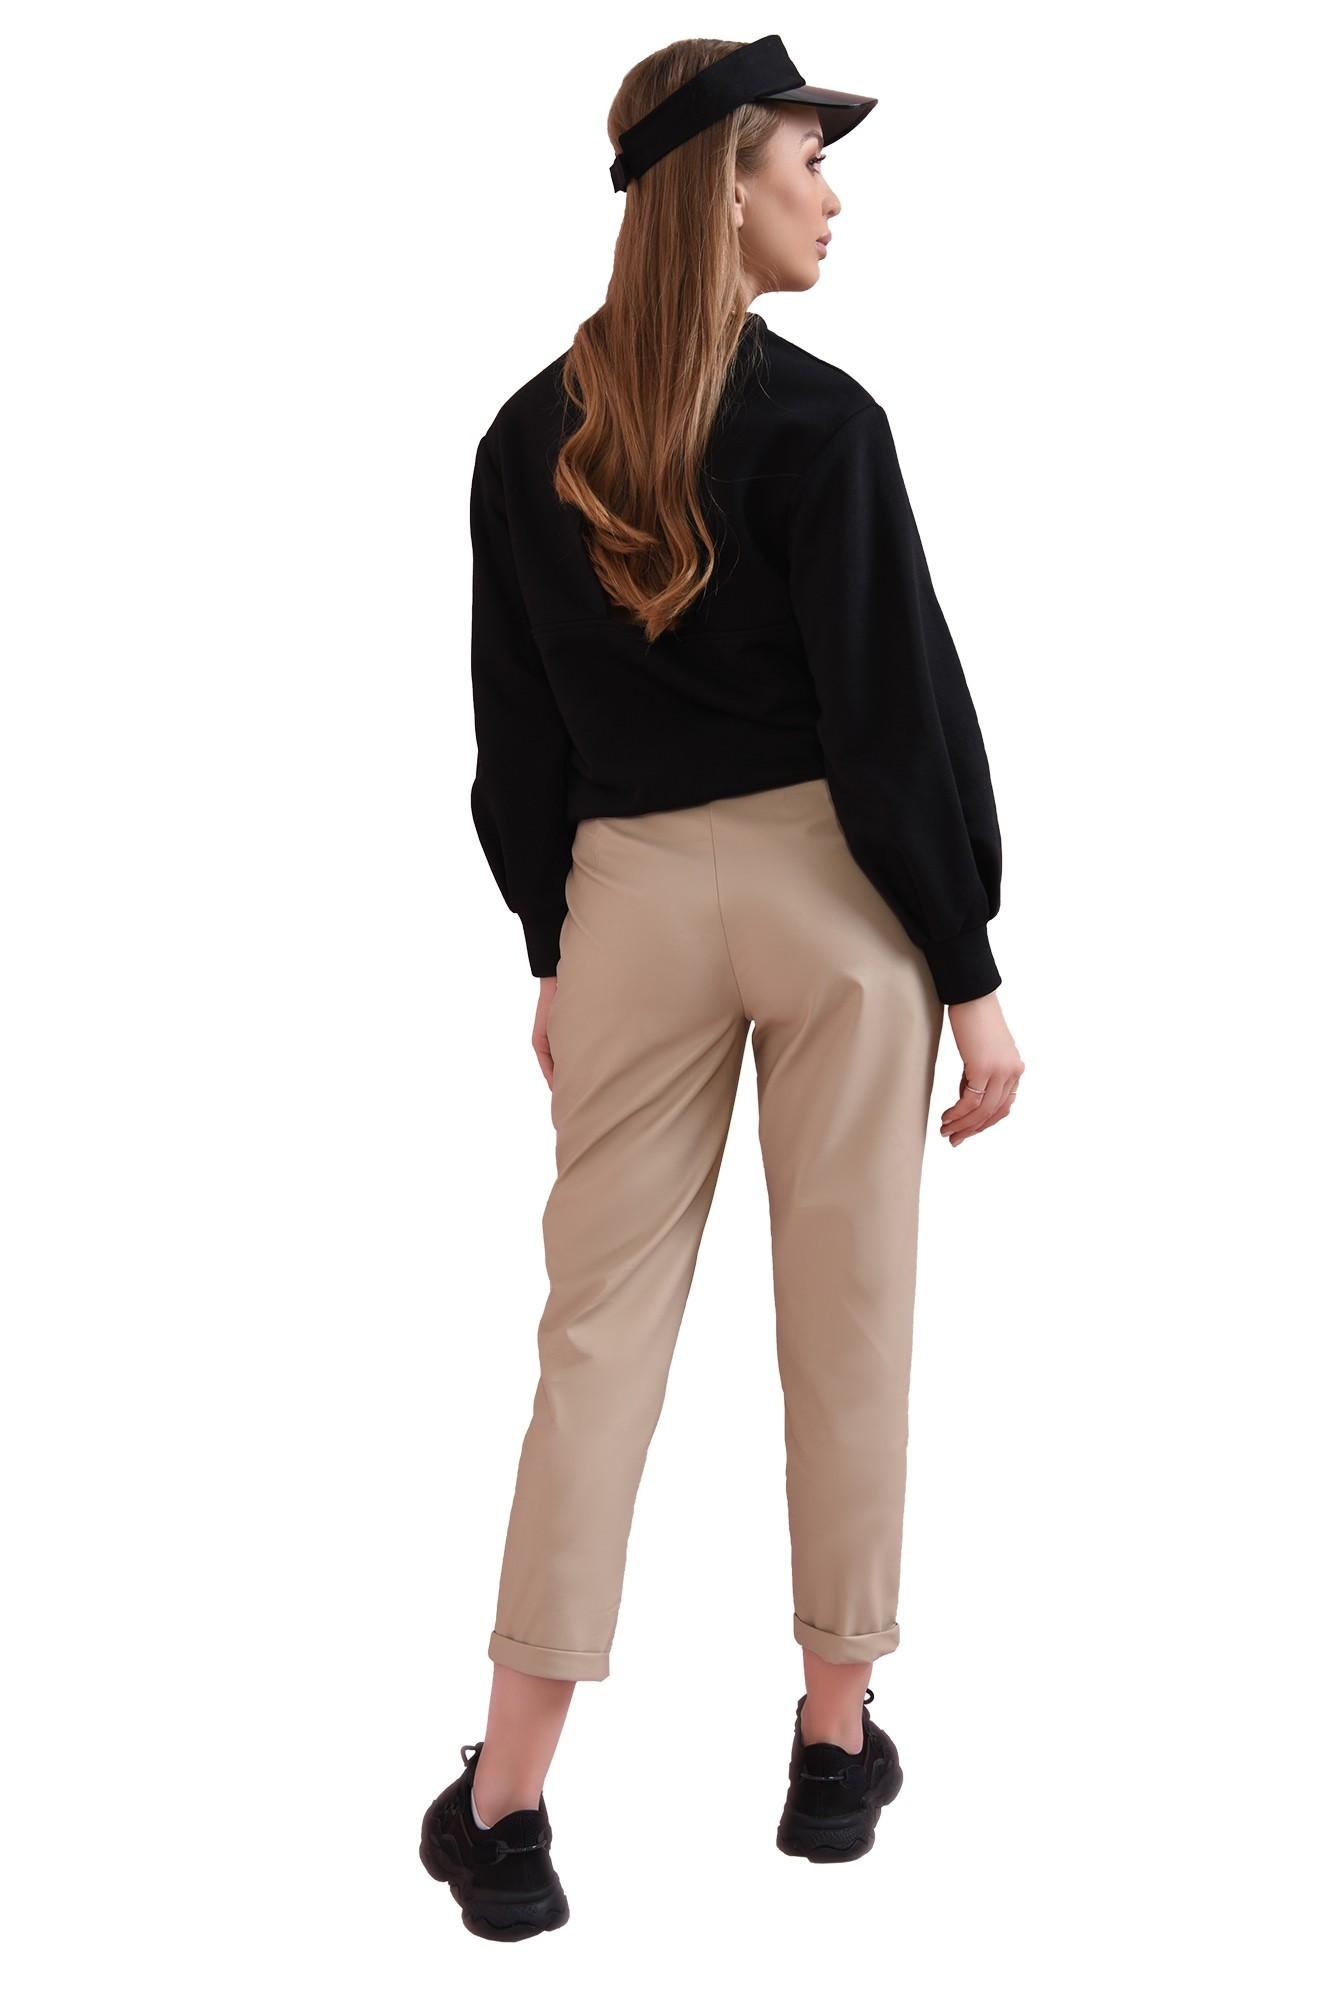 pantaloni casual, cu talie medie, cu buzunare